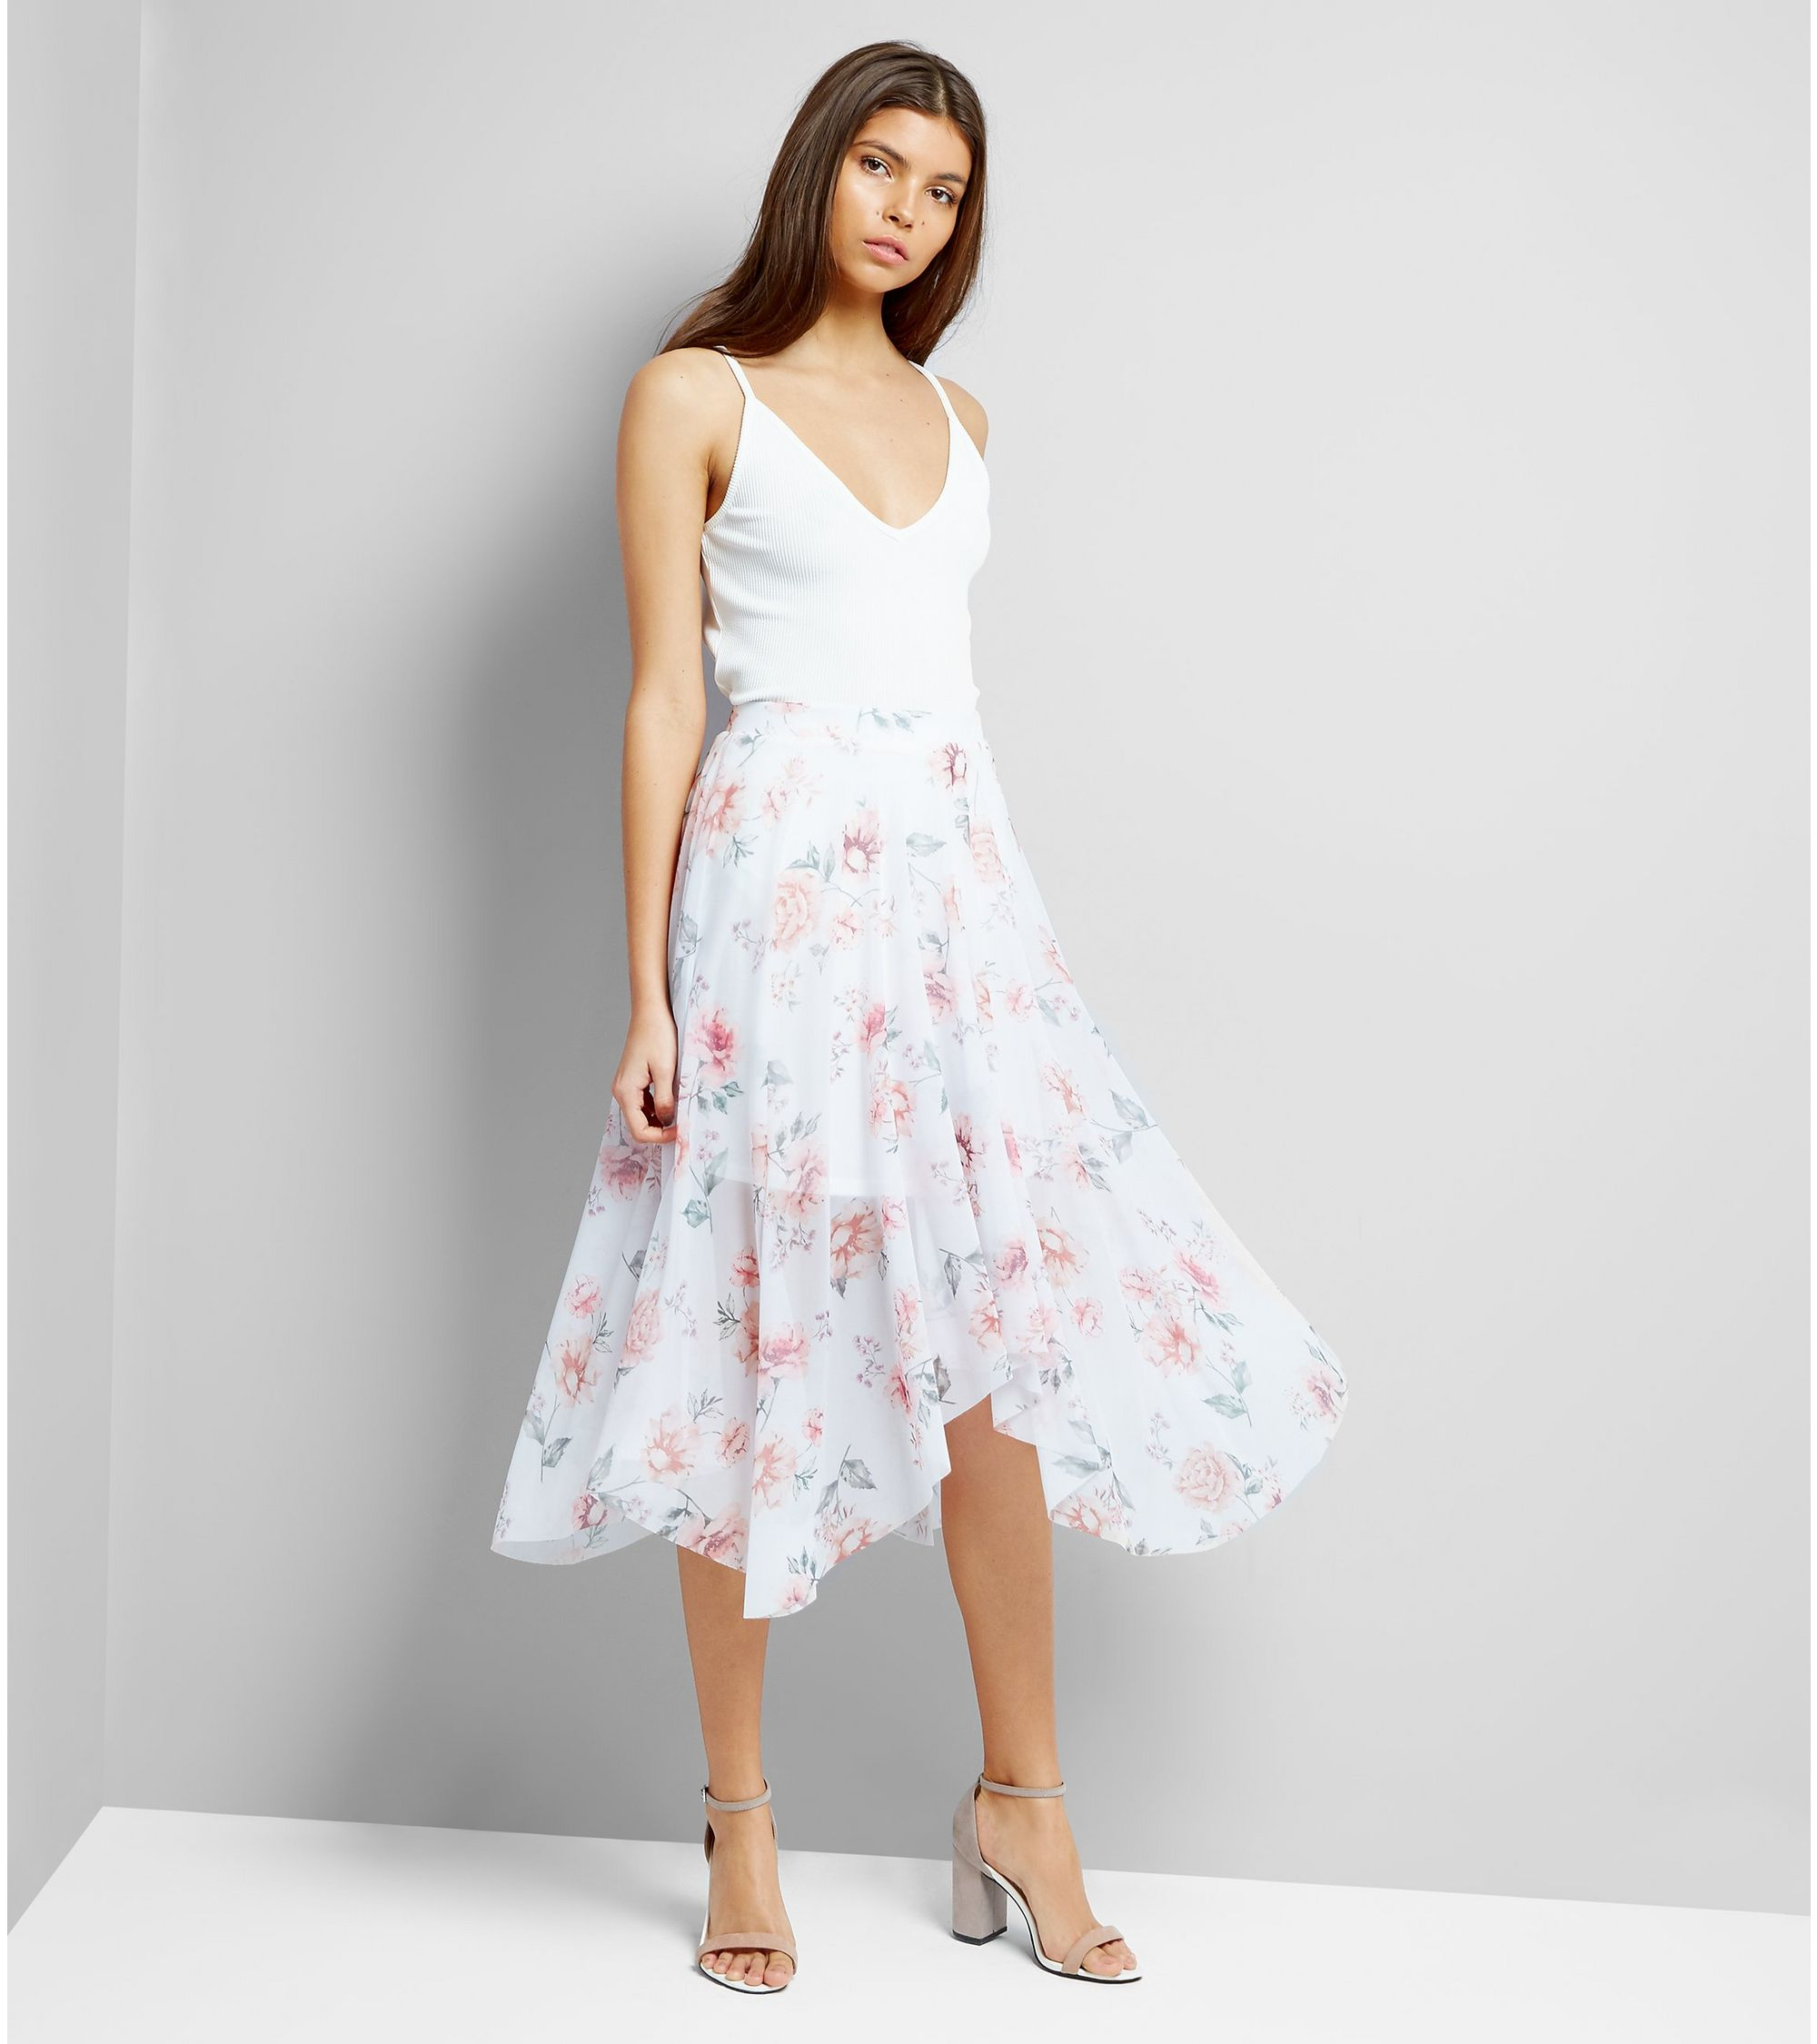 8a1d0c6c86 New Look White Floral Print Hanky Hem Midi Skirt at £16   love the ...